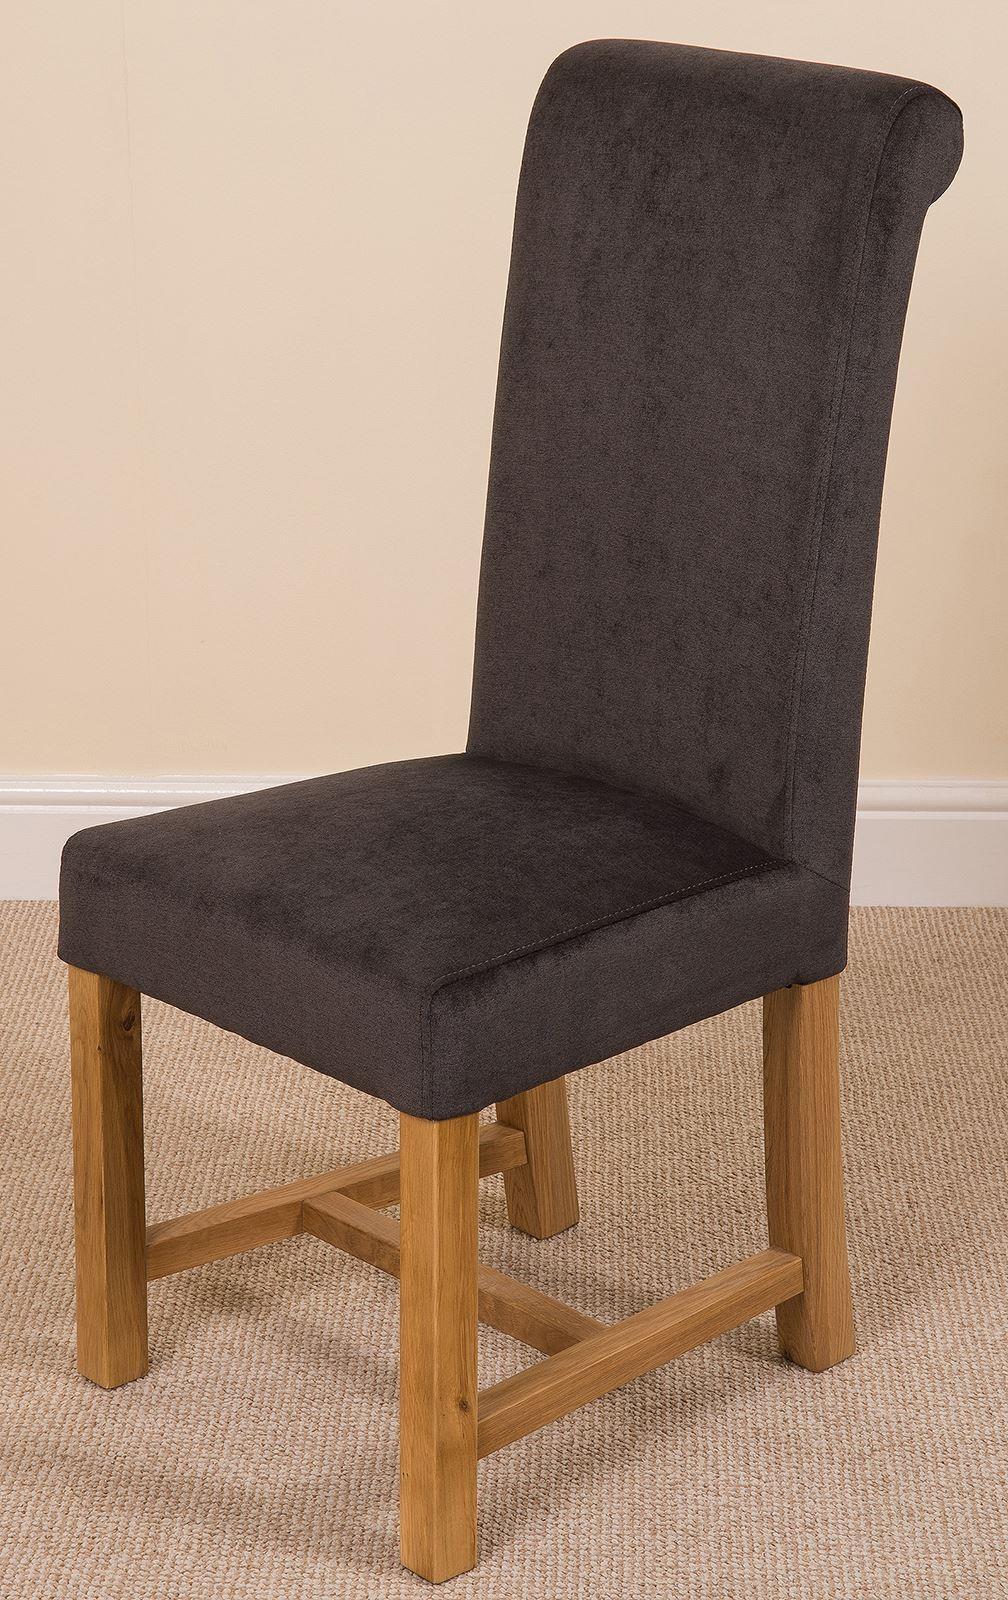 Washington Scroll Top Dining Chair [Black Fabric]